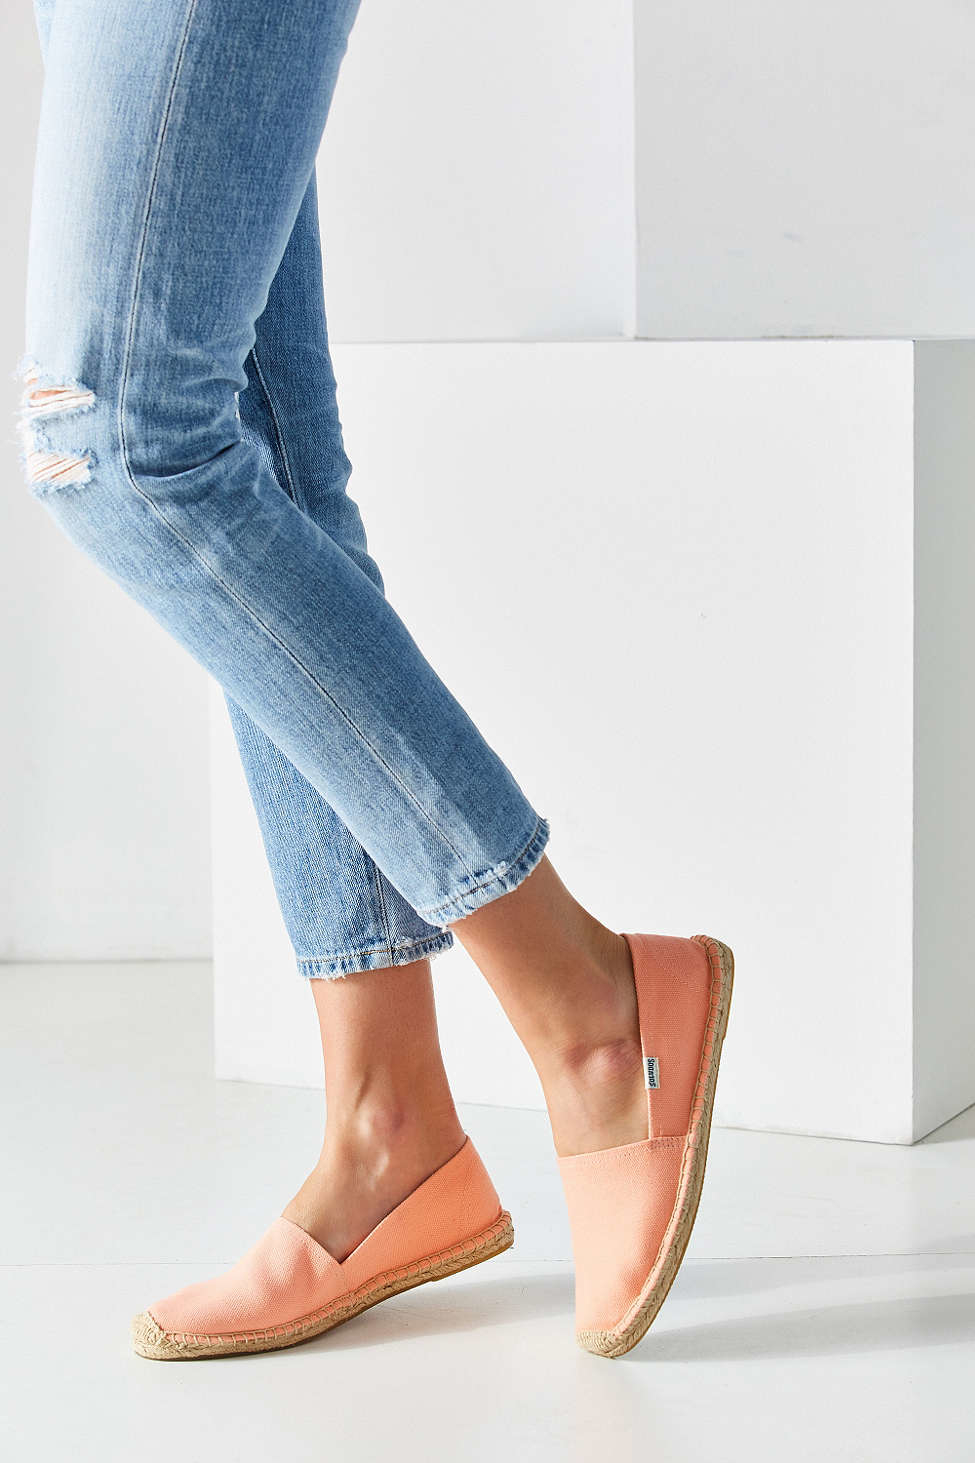 51622ca1ac0 Lyst - Soludos Dali Espadrille Slip-on Shoe in Pink